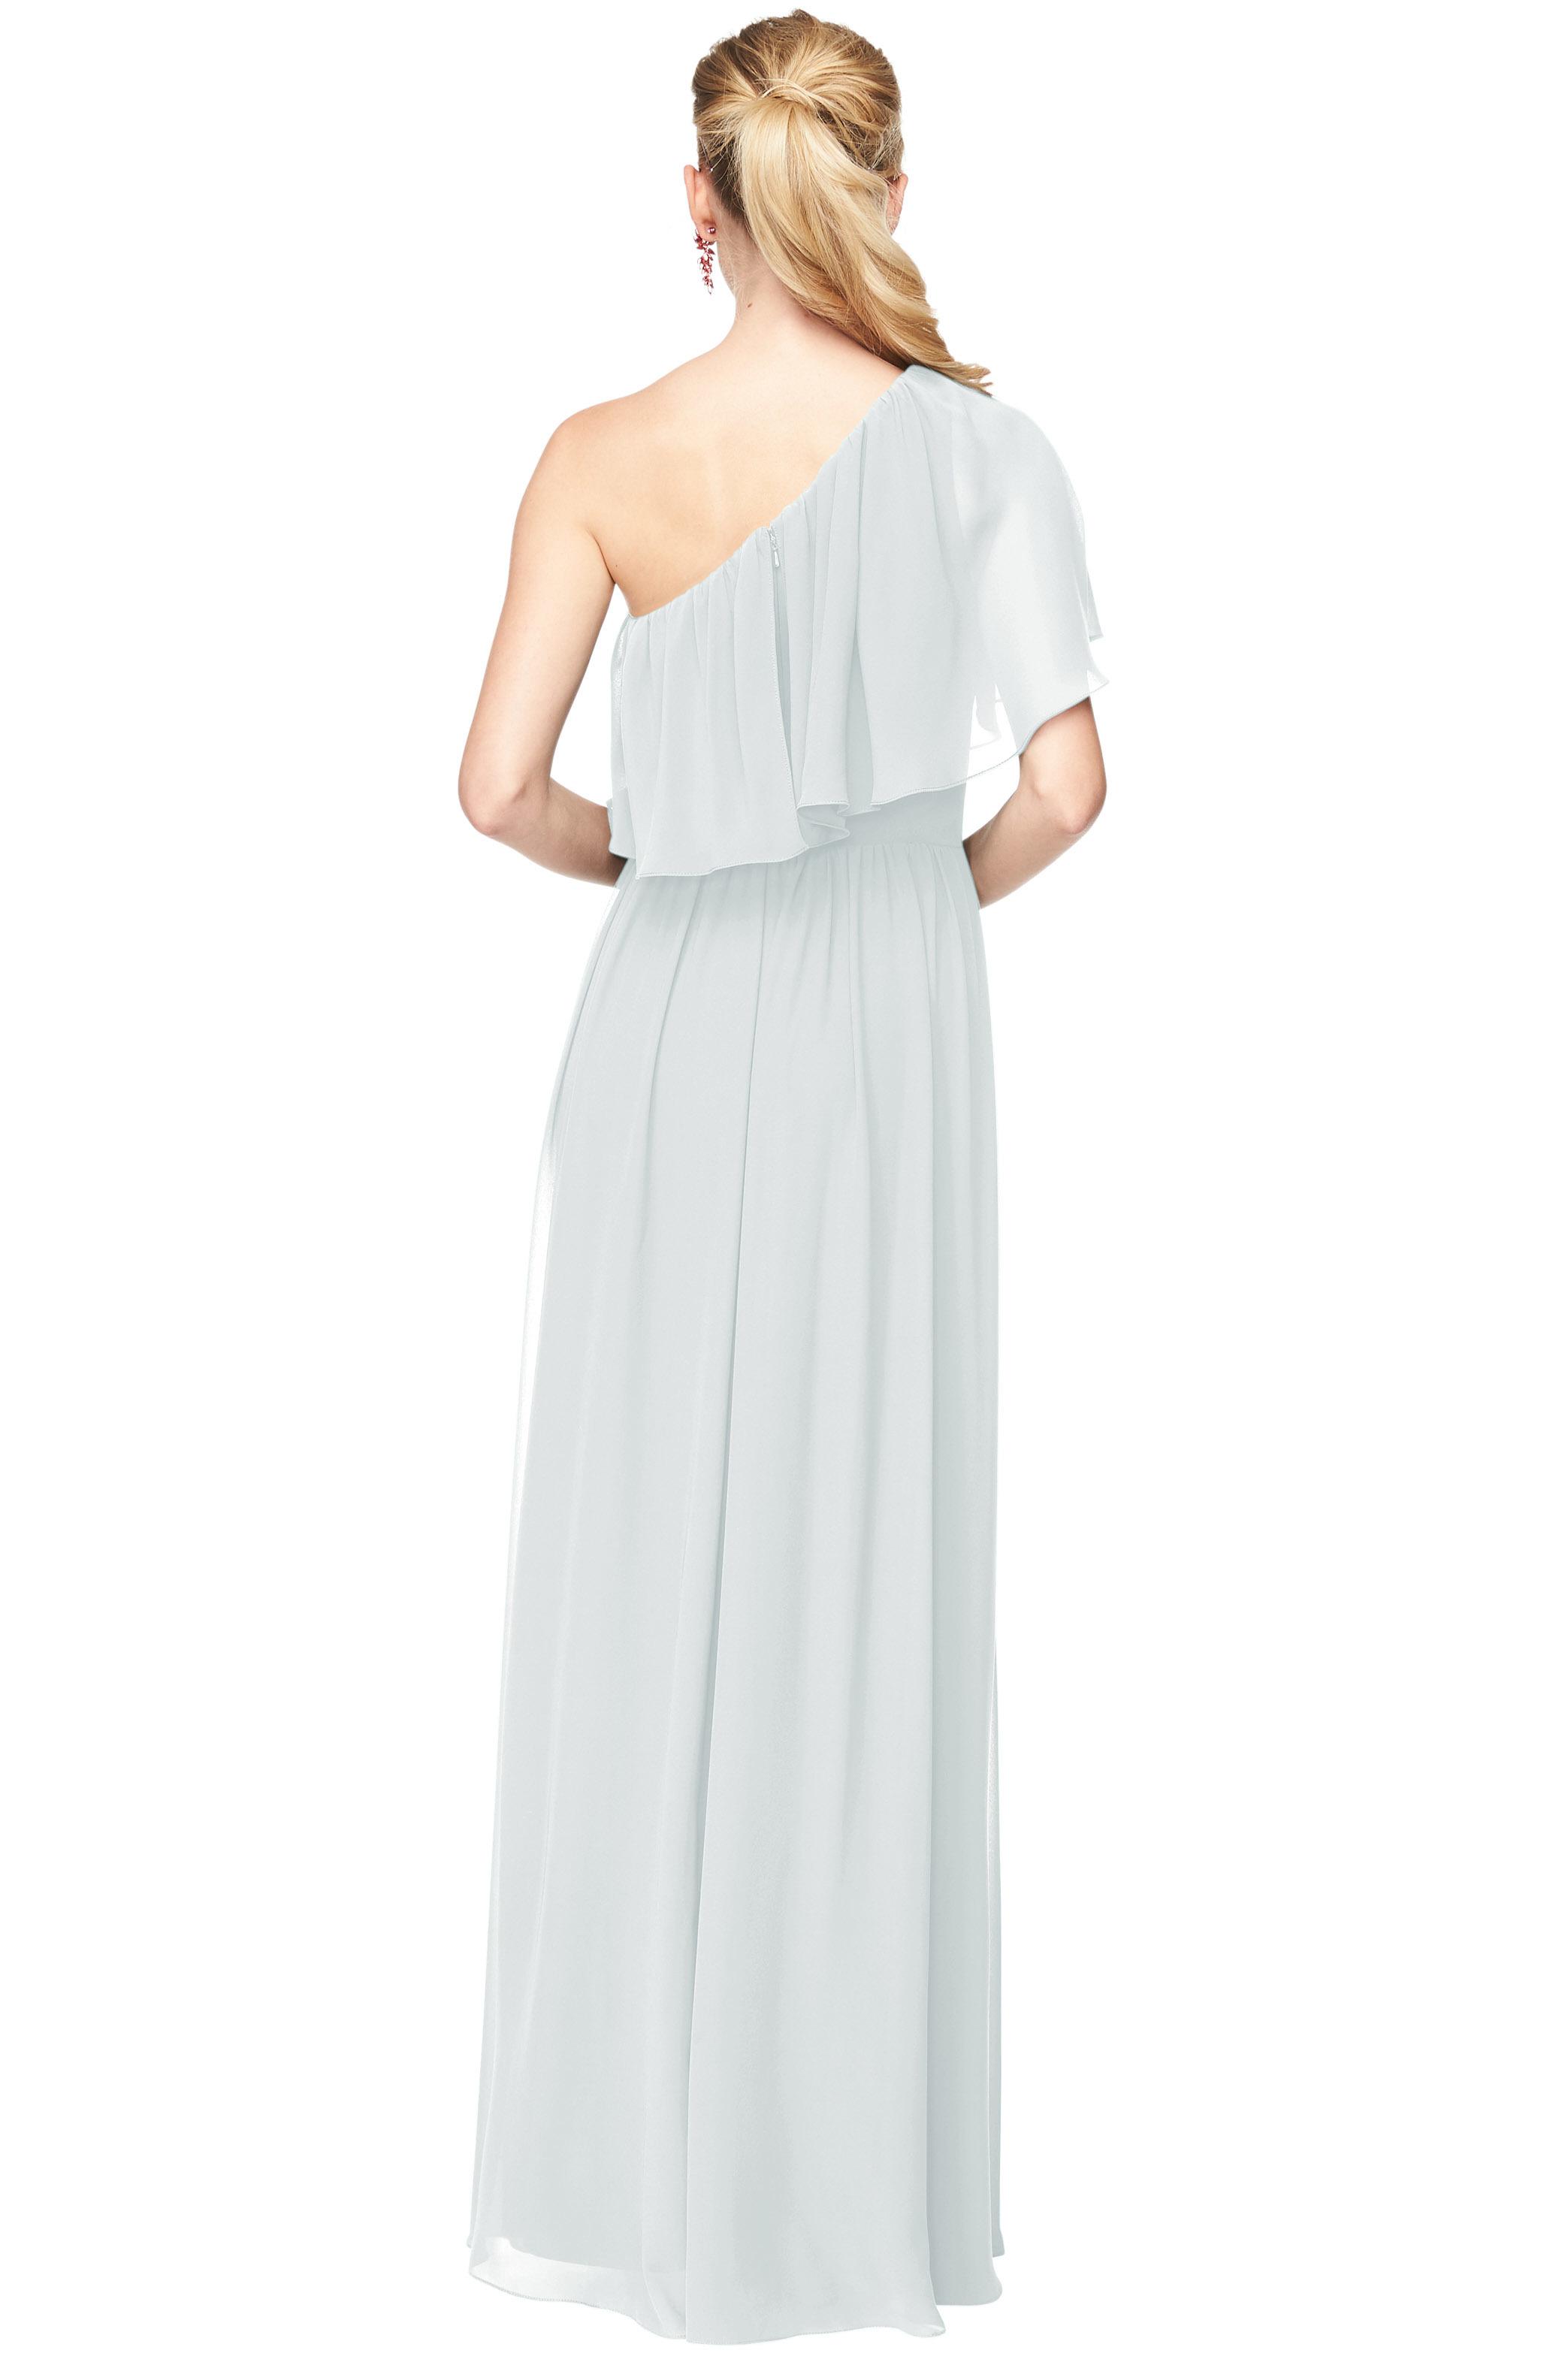 Bill Levkoff MIST Chiffon One Shoulder A-Line gown, $184.00 Back